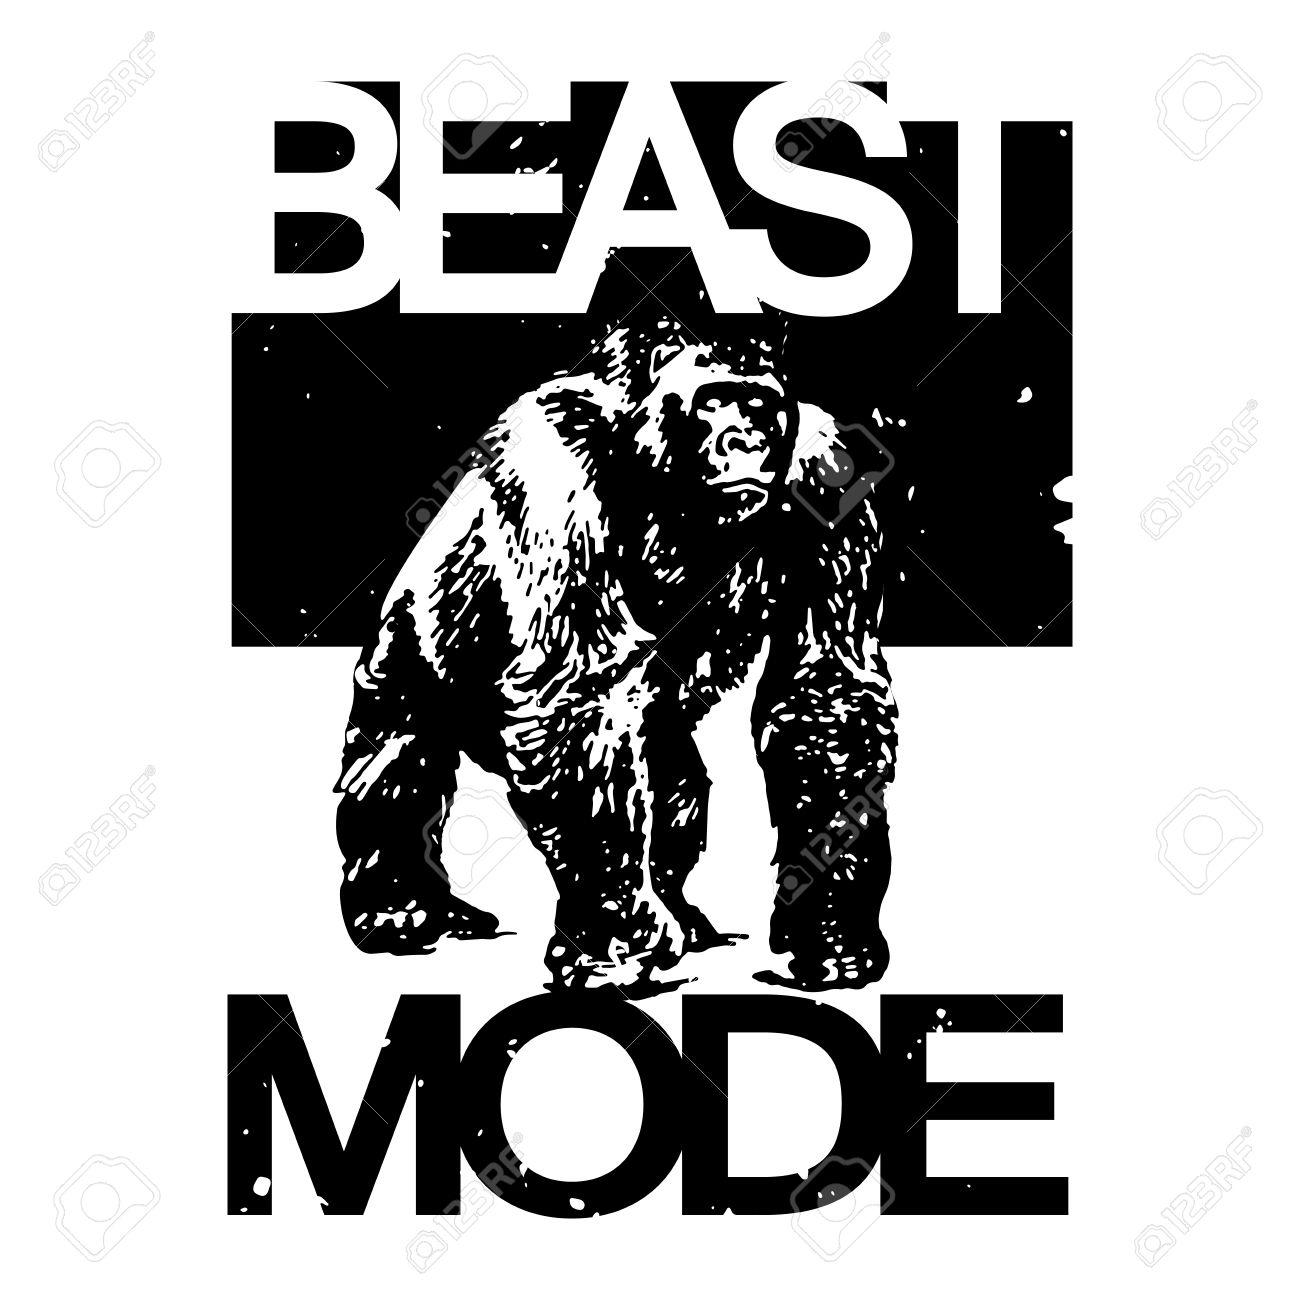 T shirt design vector - Beast Mode Big Gorilla Monkey Monochrome T Shirt Design Vector Illustration Stock Vector